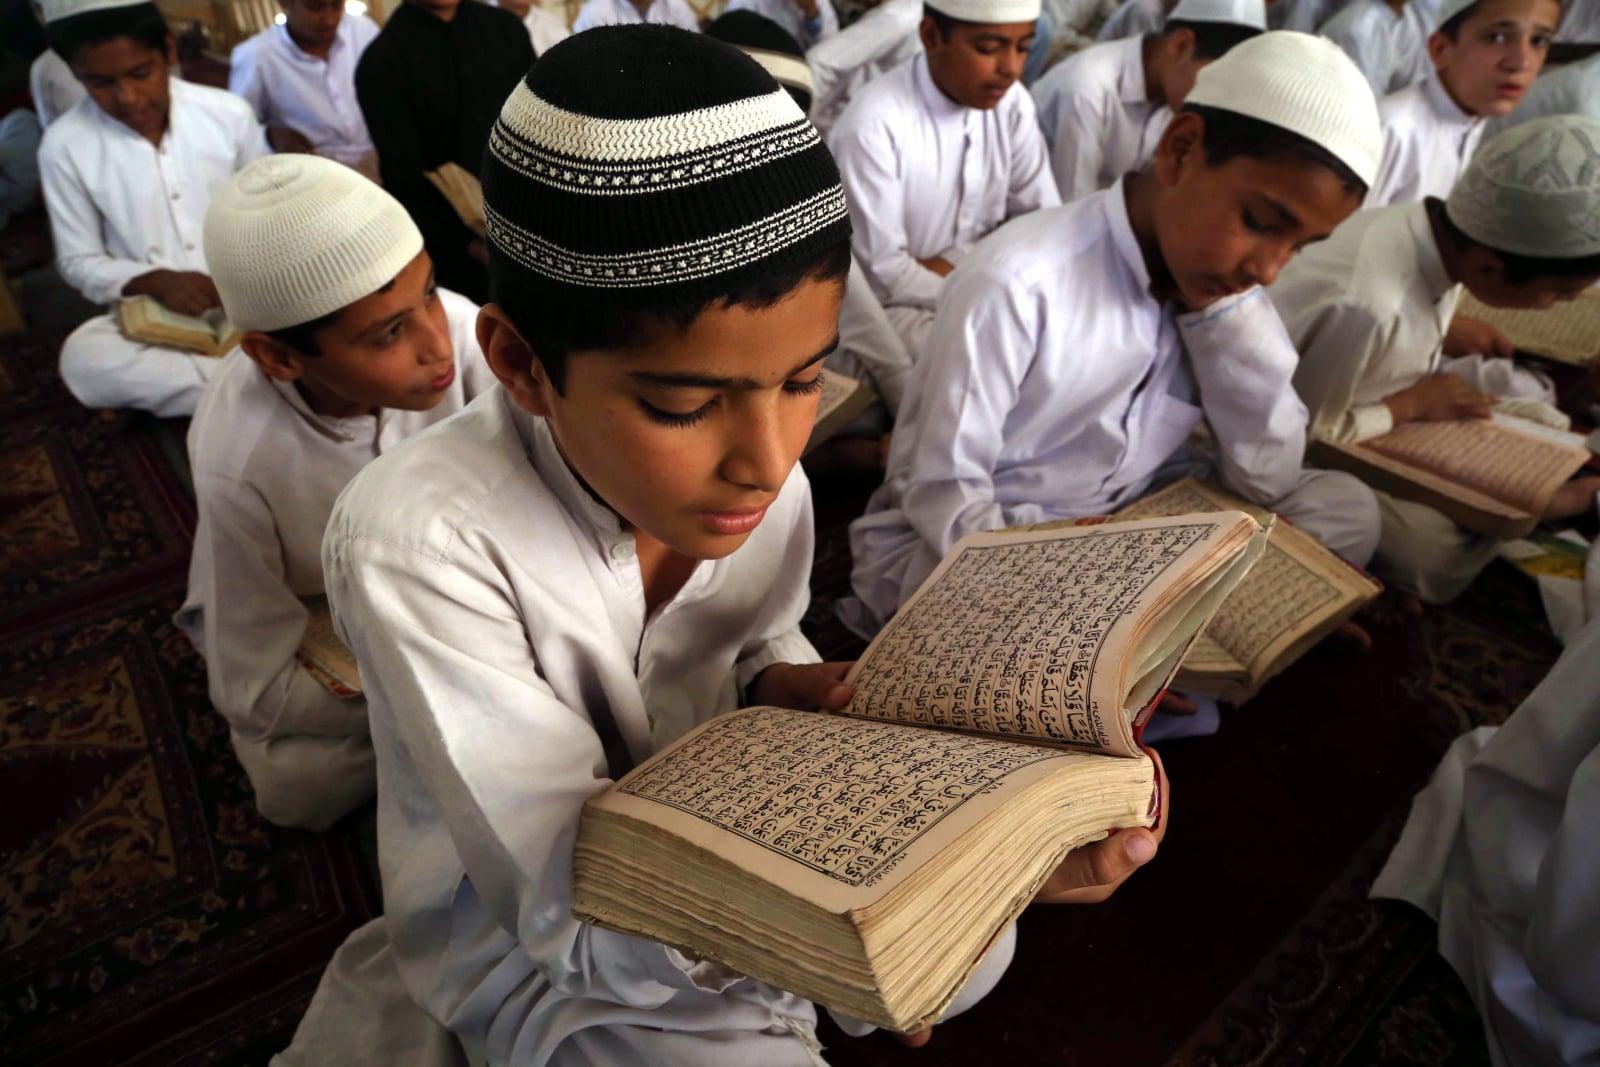 Muzułmanie w Afganistanie  EPA/GHULAMULLAH HABIBI